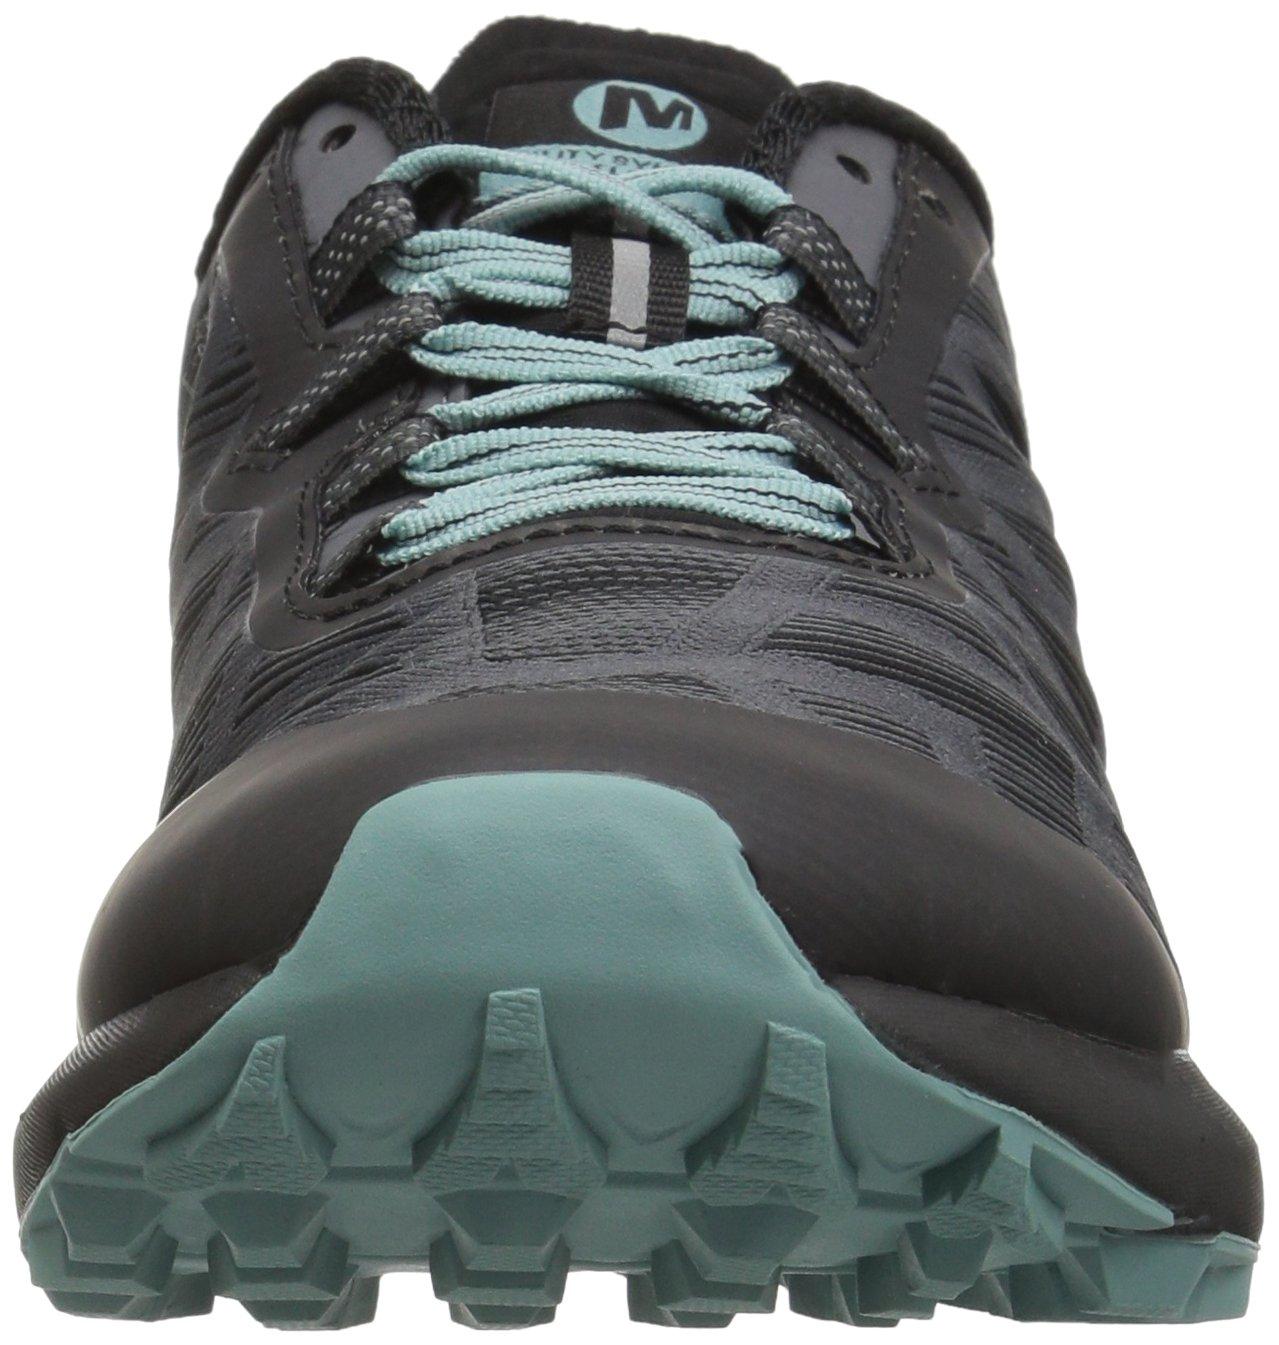 Merrell Women's Agility Synthesis Flex Sneaker B078NFX8QH 5 B(M) US|Black